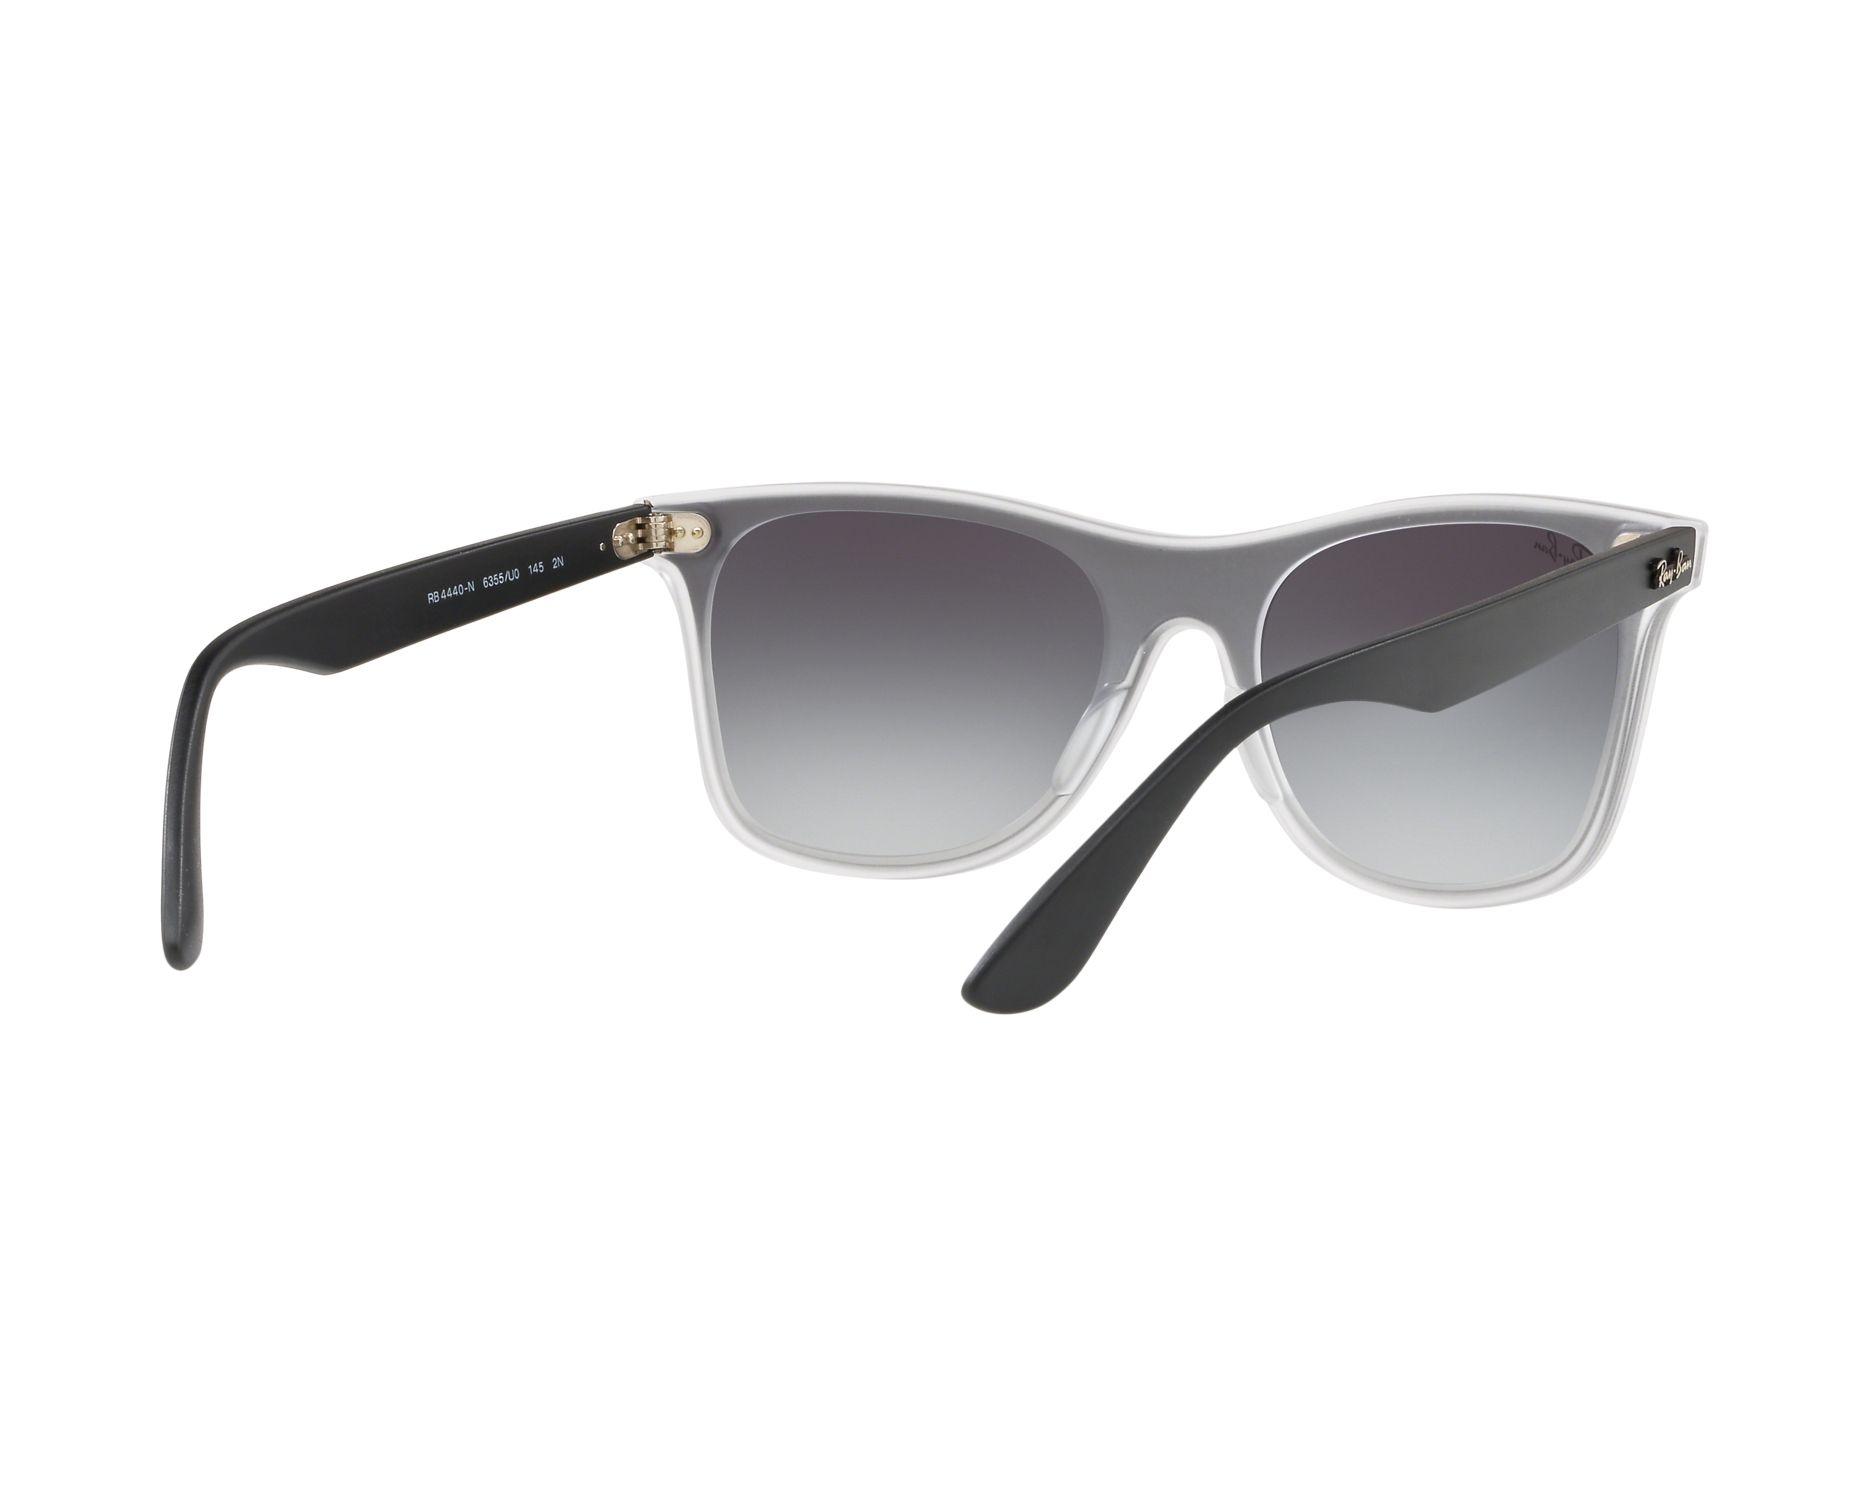 a86751f91ca Sunglasses Ray-Ban RB-4440-N 6355U0 55-18 Crystal Black 360